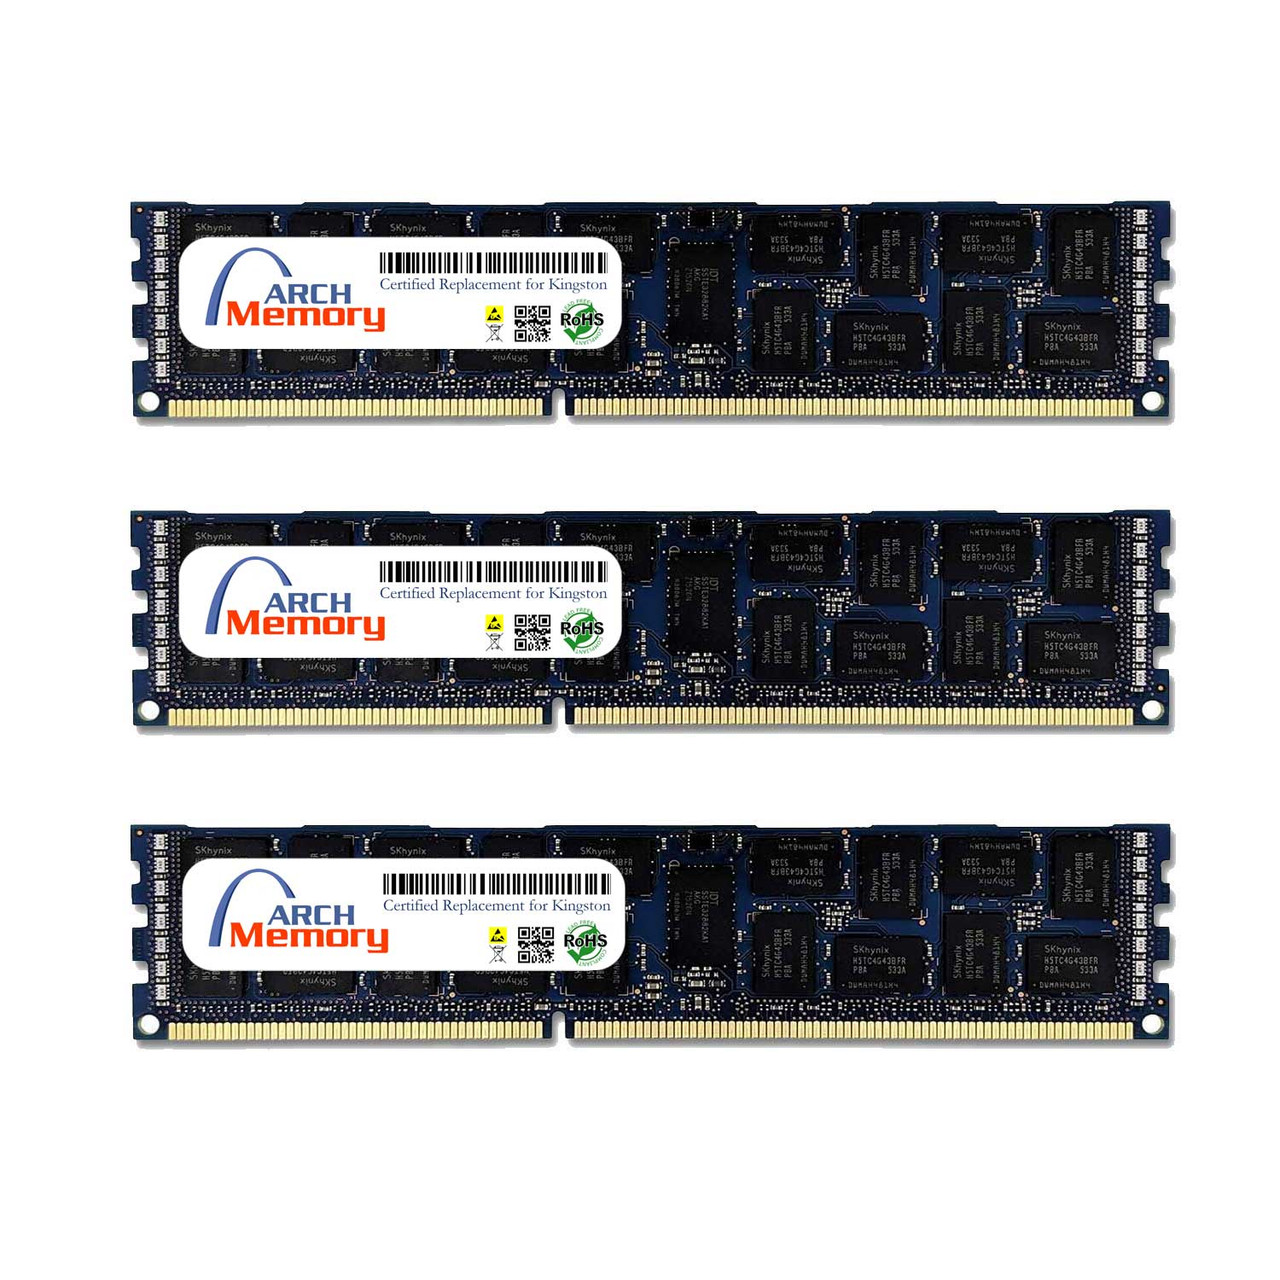 16GB KTH-PL313Q8LVK3/48G 48GB Kit (3 x 16 GB) DDR3L 1333MHz 240-Pin ECC RDIMM Server RAM   Kingston Replacement Memory